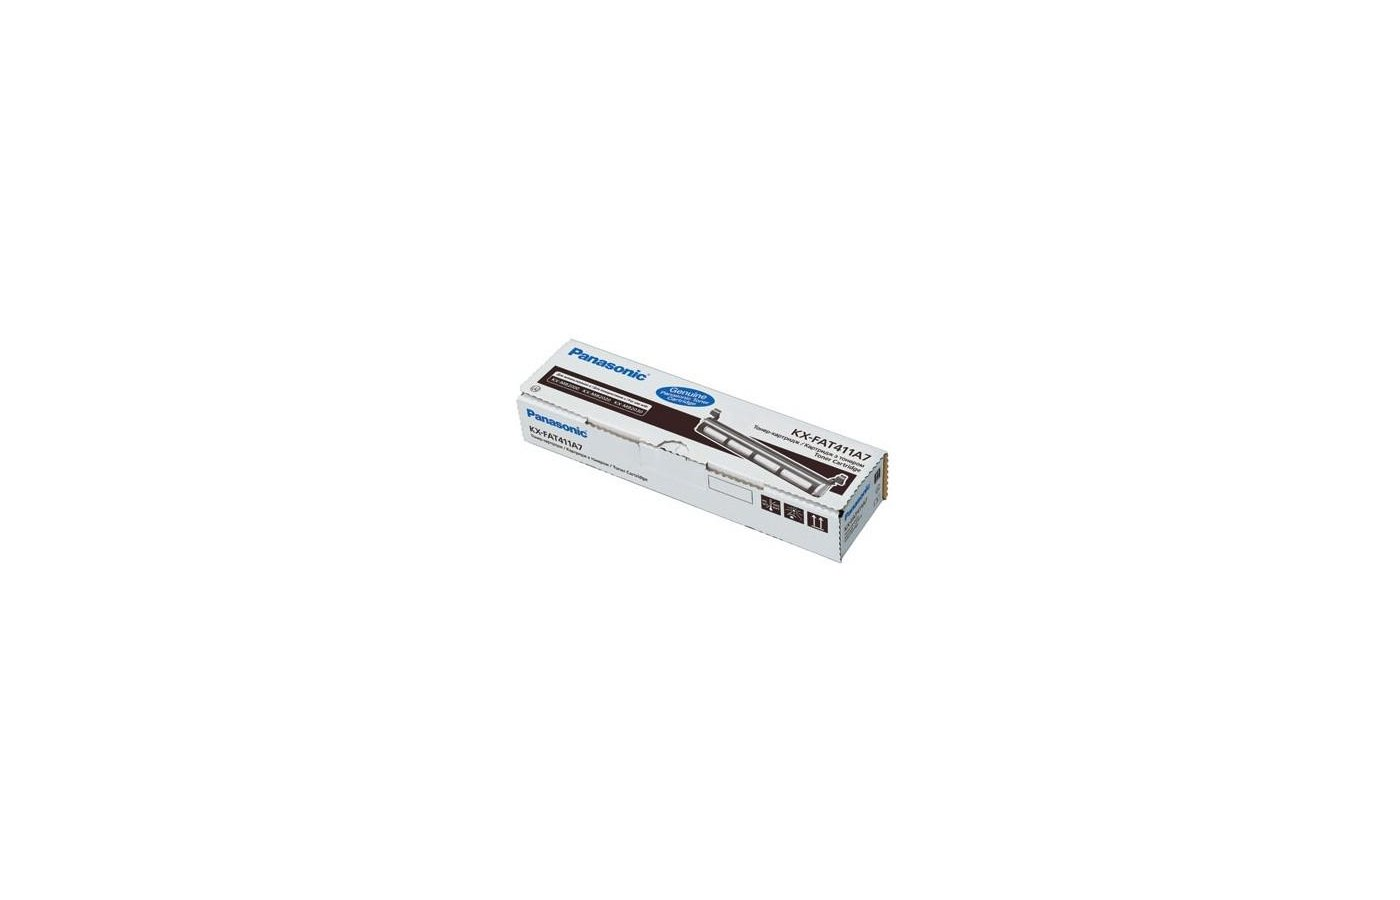 Картридж лазерный Panasonic KX-FAT411A для KX-MB2000/2010/2020/2030 (2 000 стр)